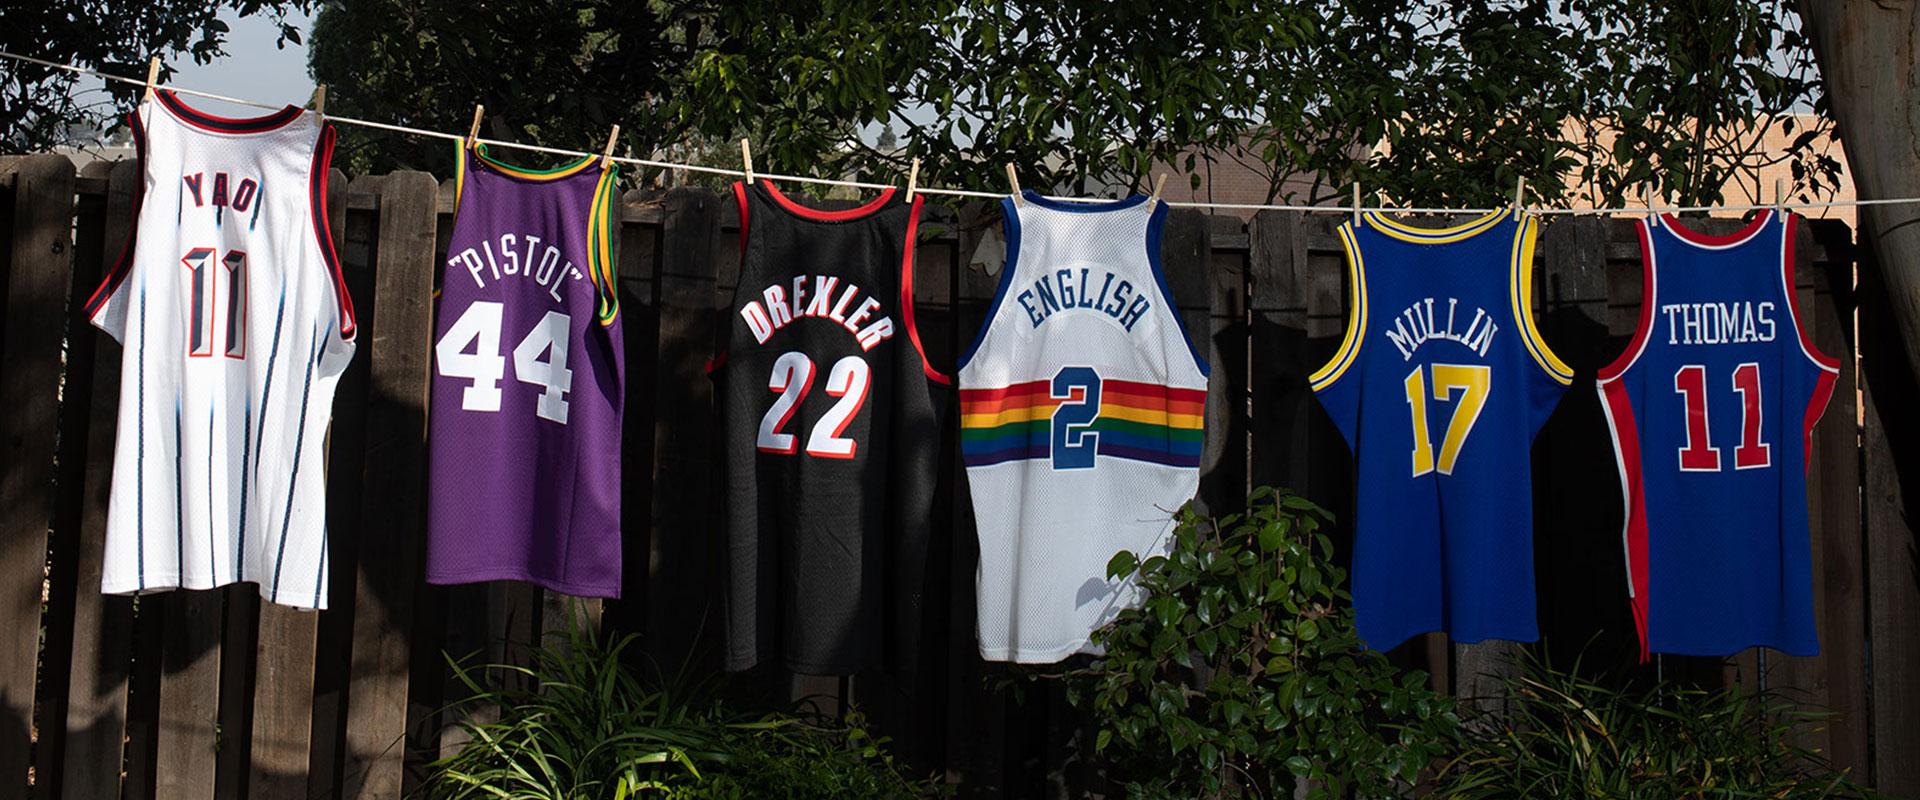 NBA E A TEMPORADA DE SEUS 75 ANOS